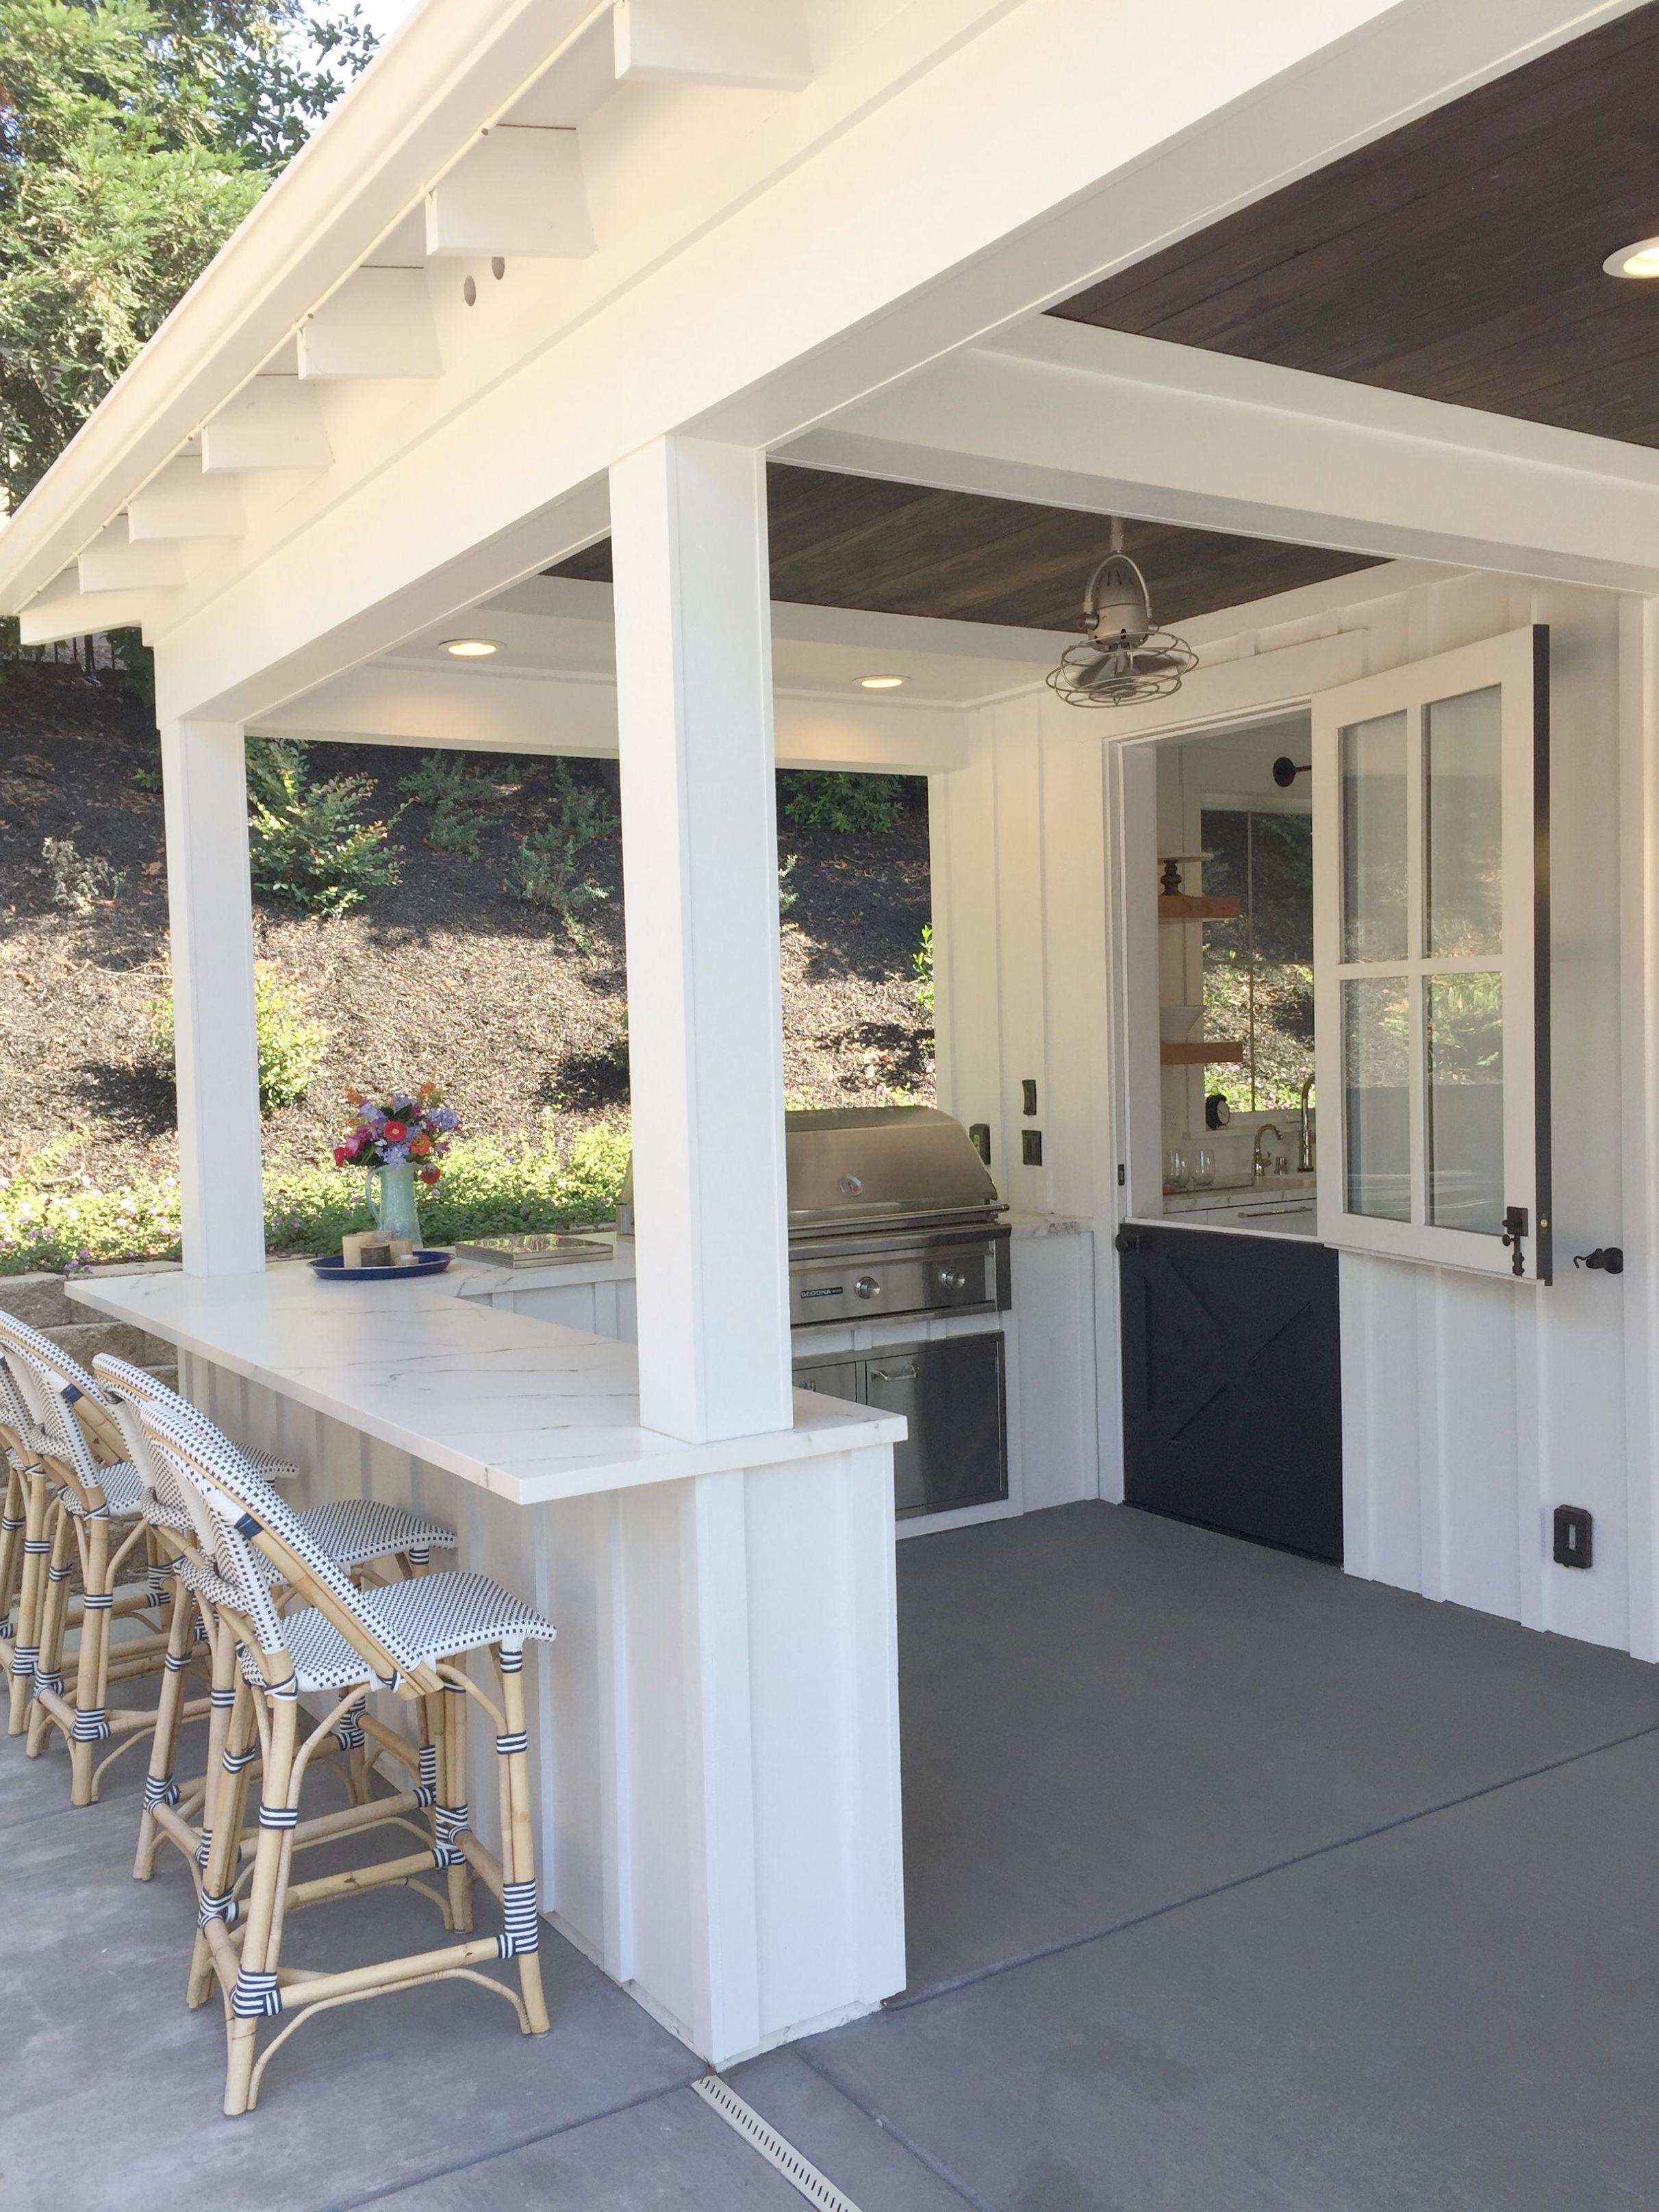 Free Landscape Design Software Uk Below Tropical Landscape Plants Once Landscaping Ideas Fo Luxury Outdoor Kitchen Outdoor Kitchen Design Outdoor Kitchen Decor